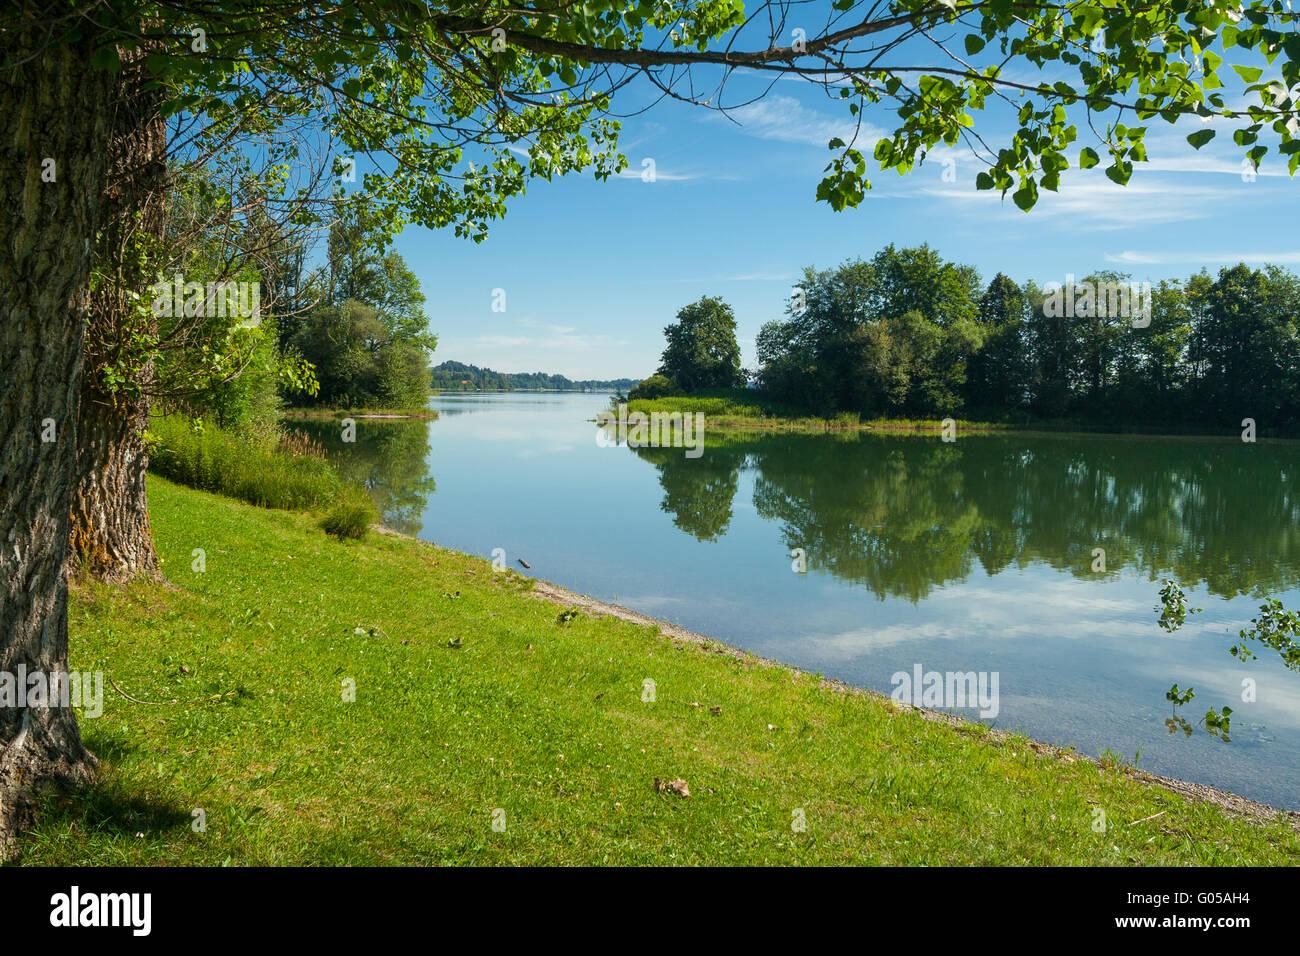 Lake Forggensee near the city Füssen in Bavaria - Germany Stock Photo